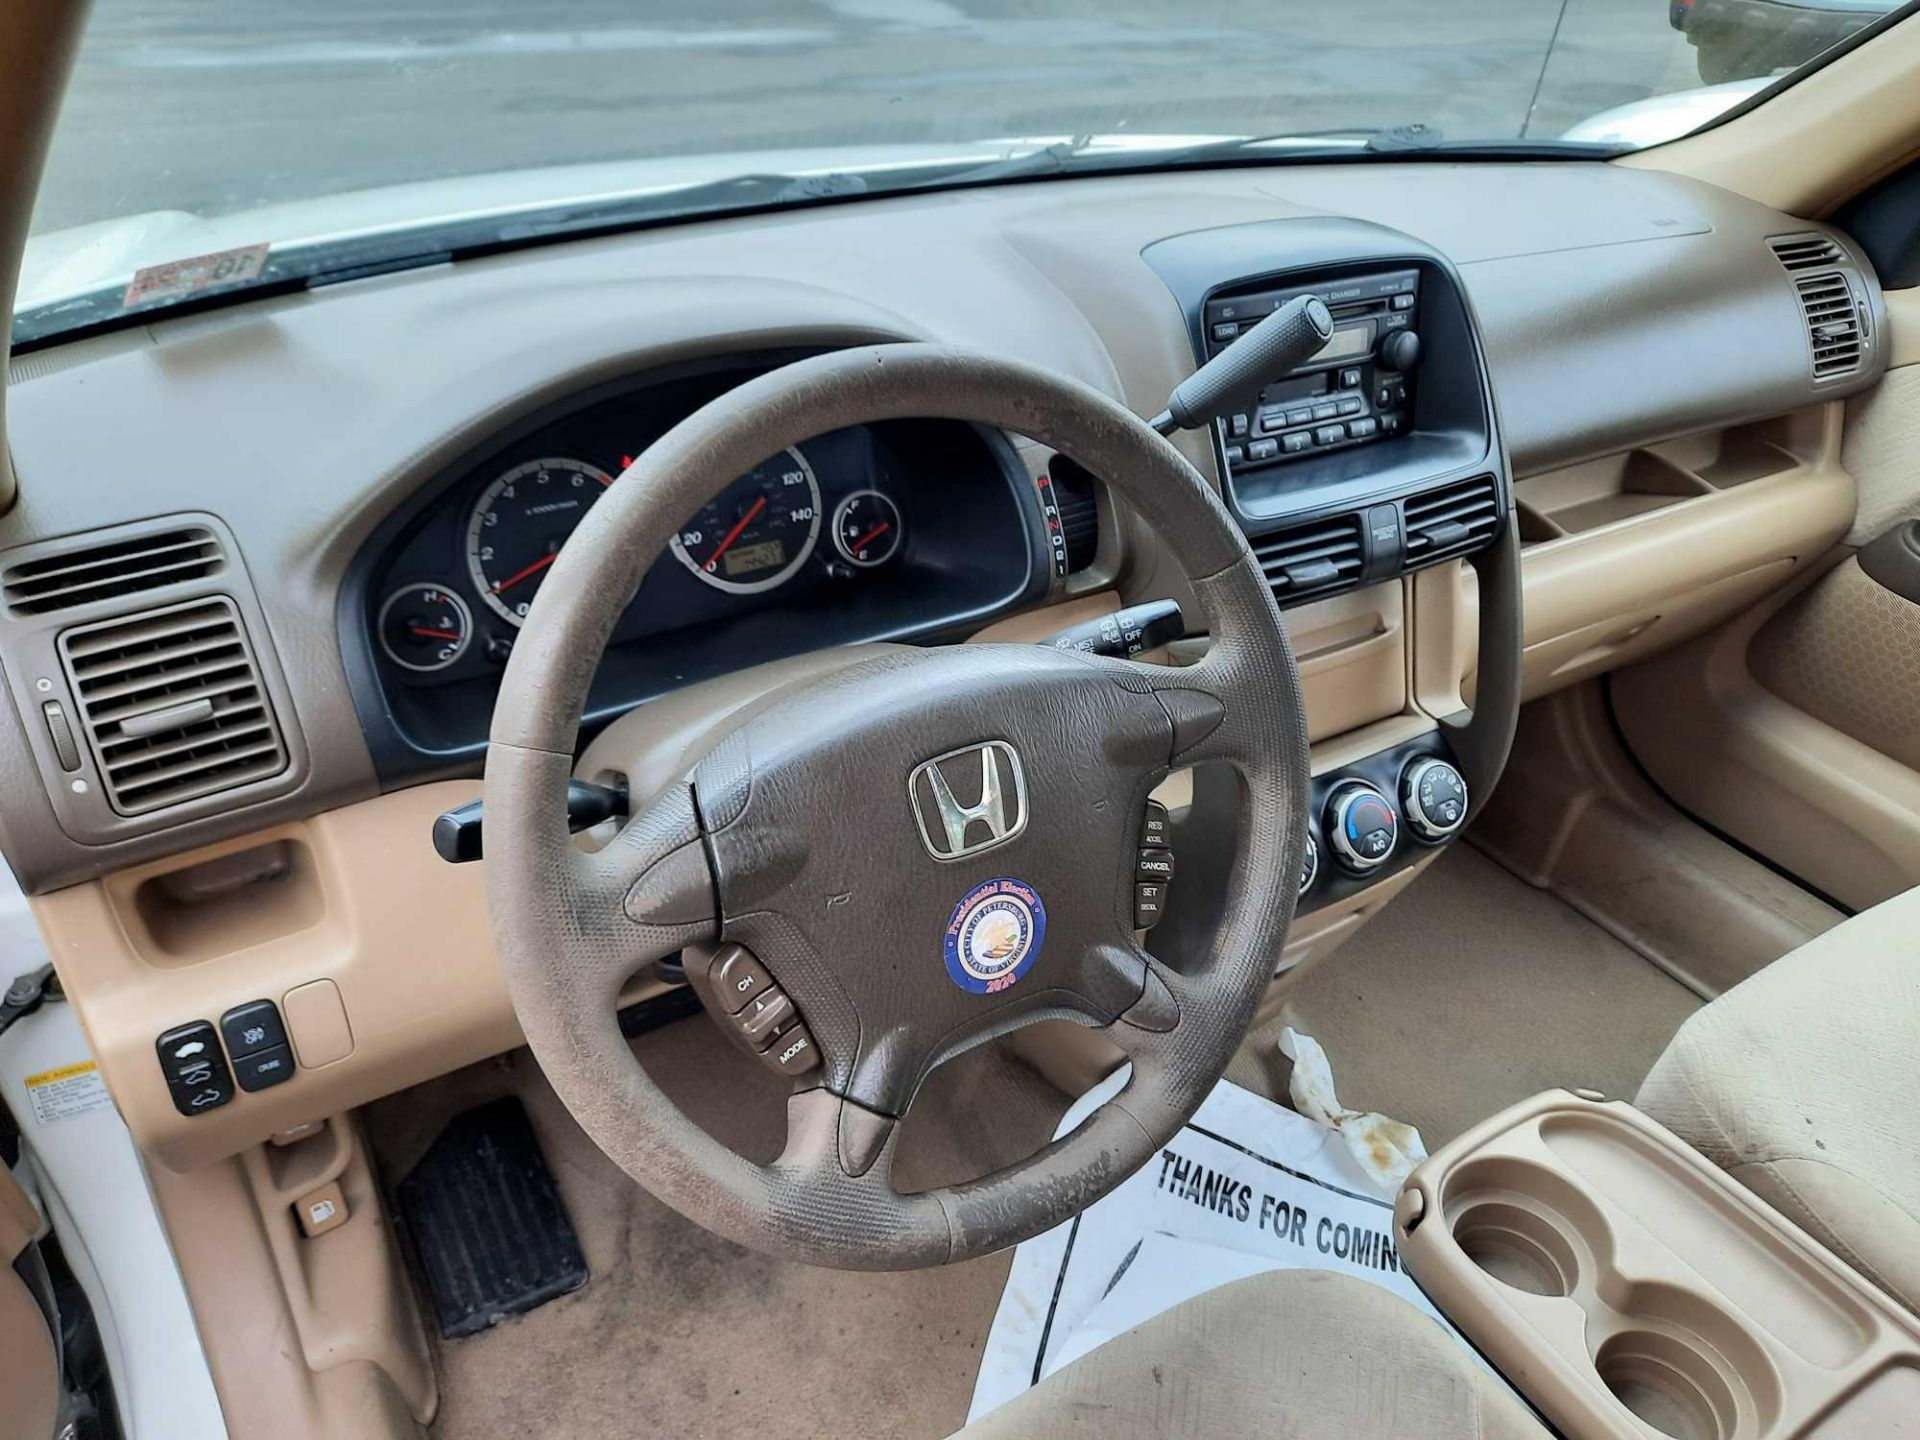 2005 HONDA CR-V - Image 9 of 18